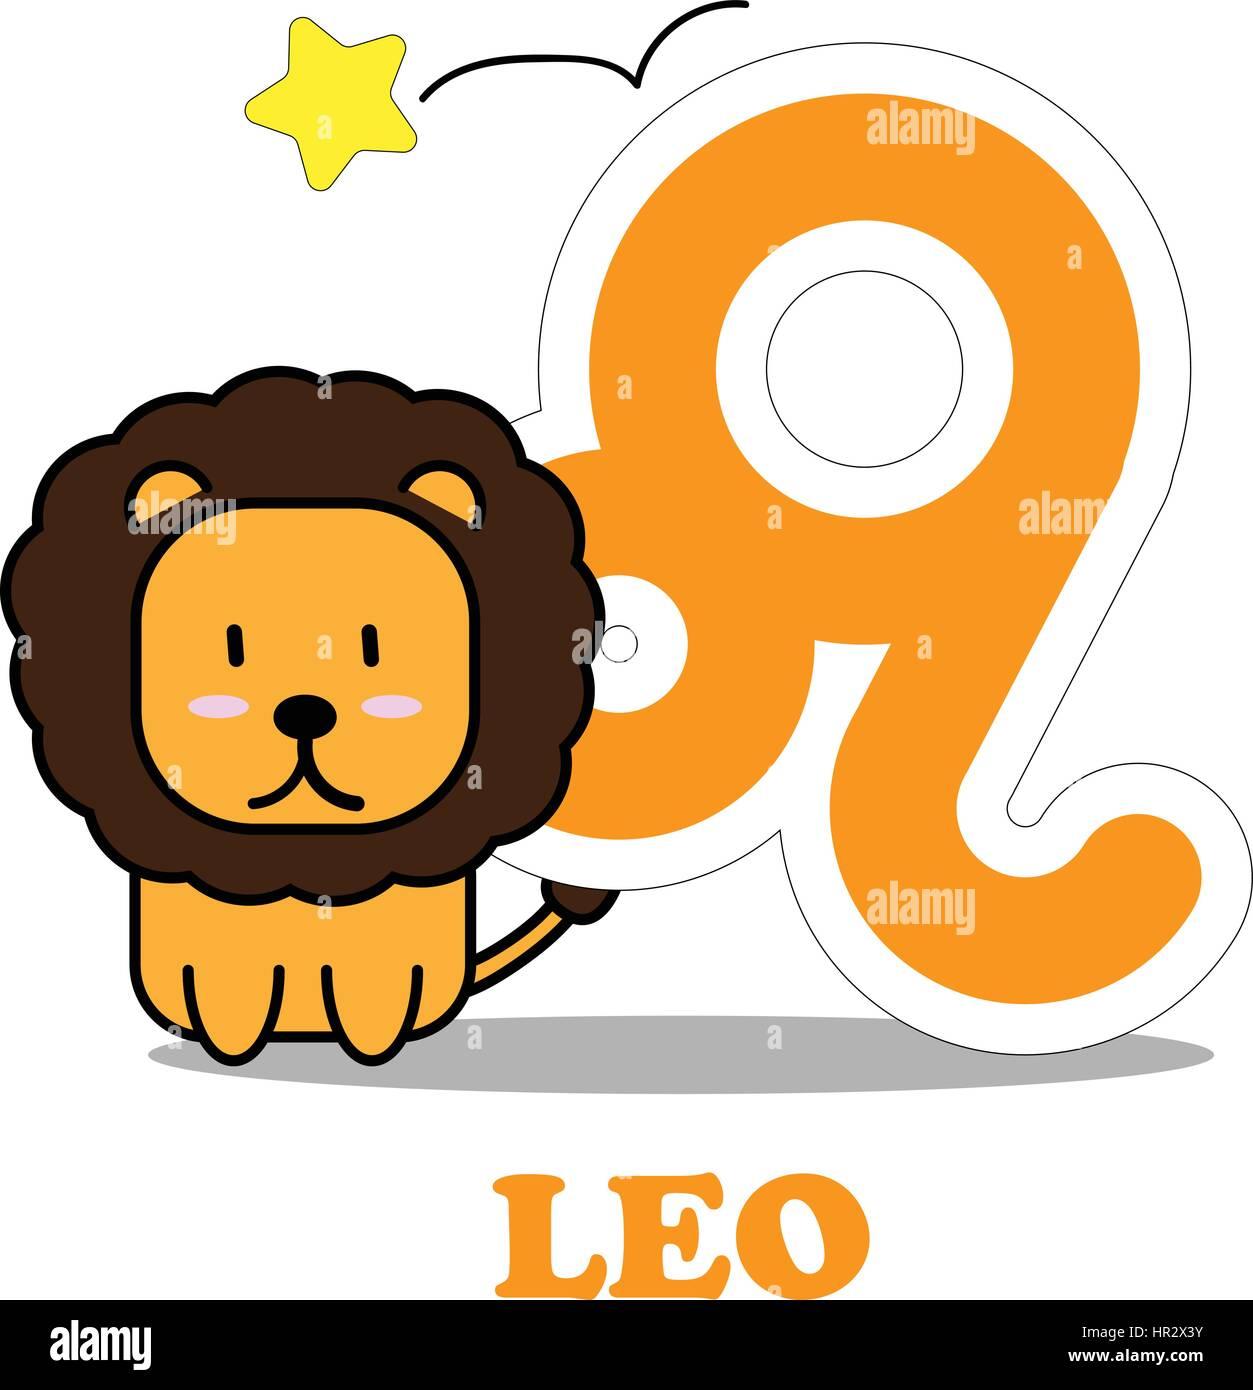 Leo zodiac star sign stock photos leo zodiac star sign stock leo cartoon with big zodiac sign icon vector isolated on white background stock image buycottarizona Image collections